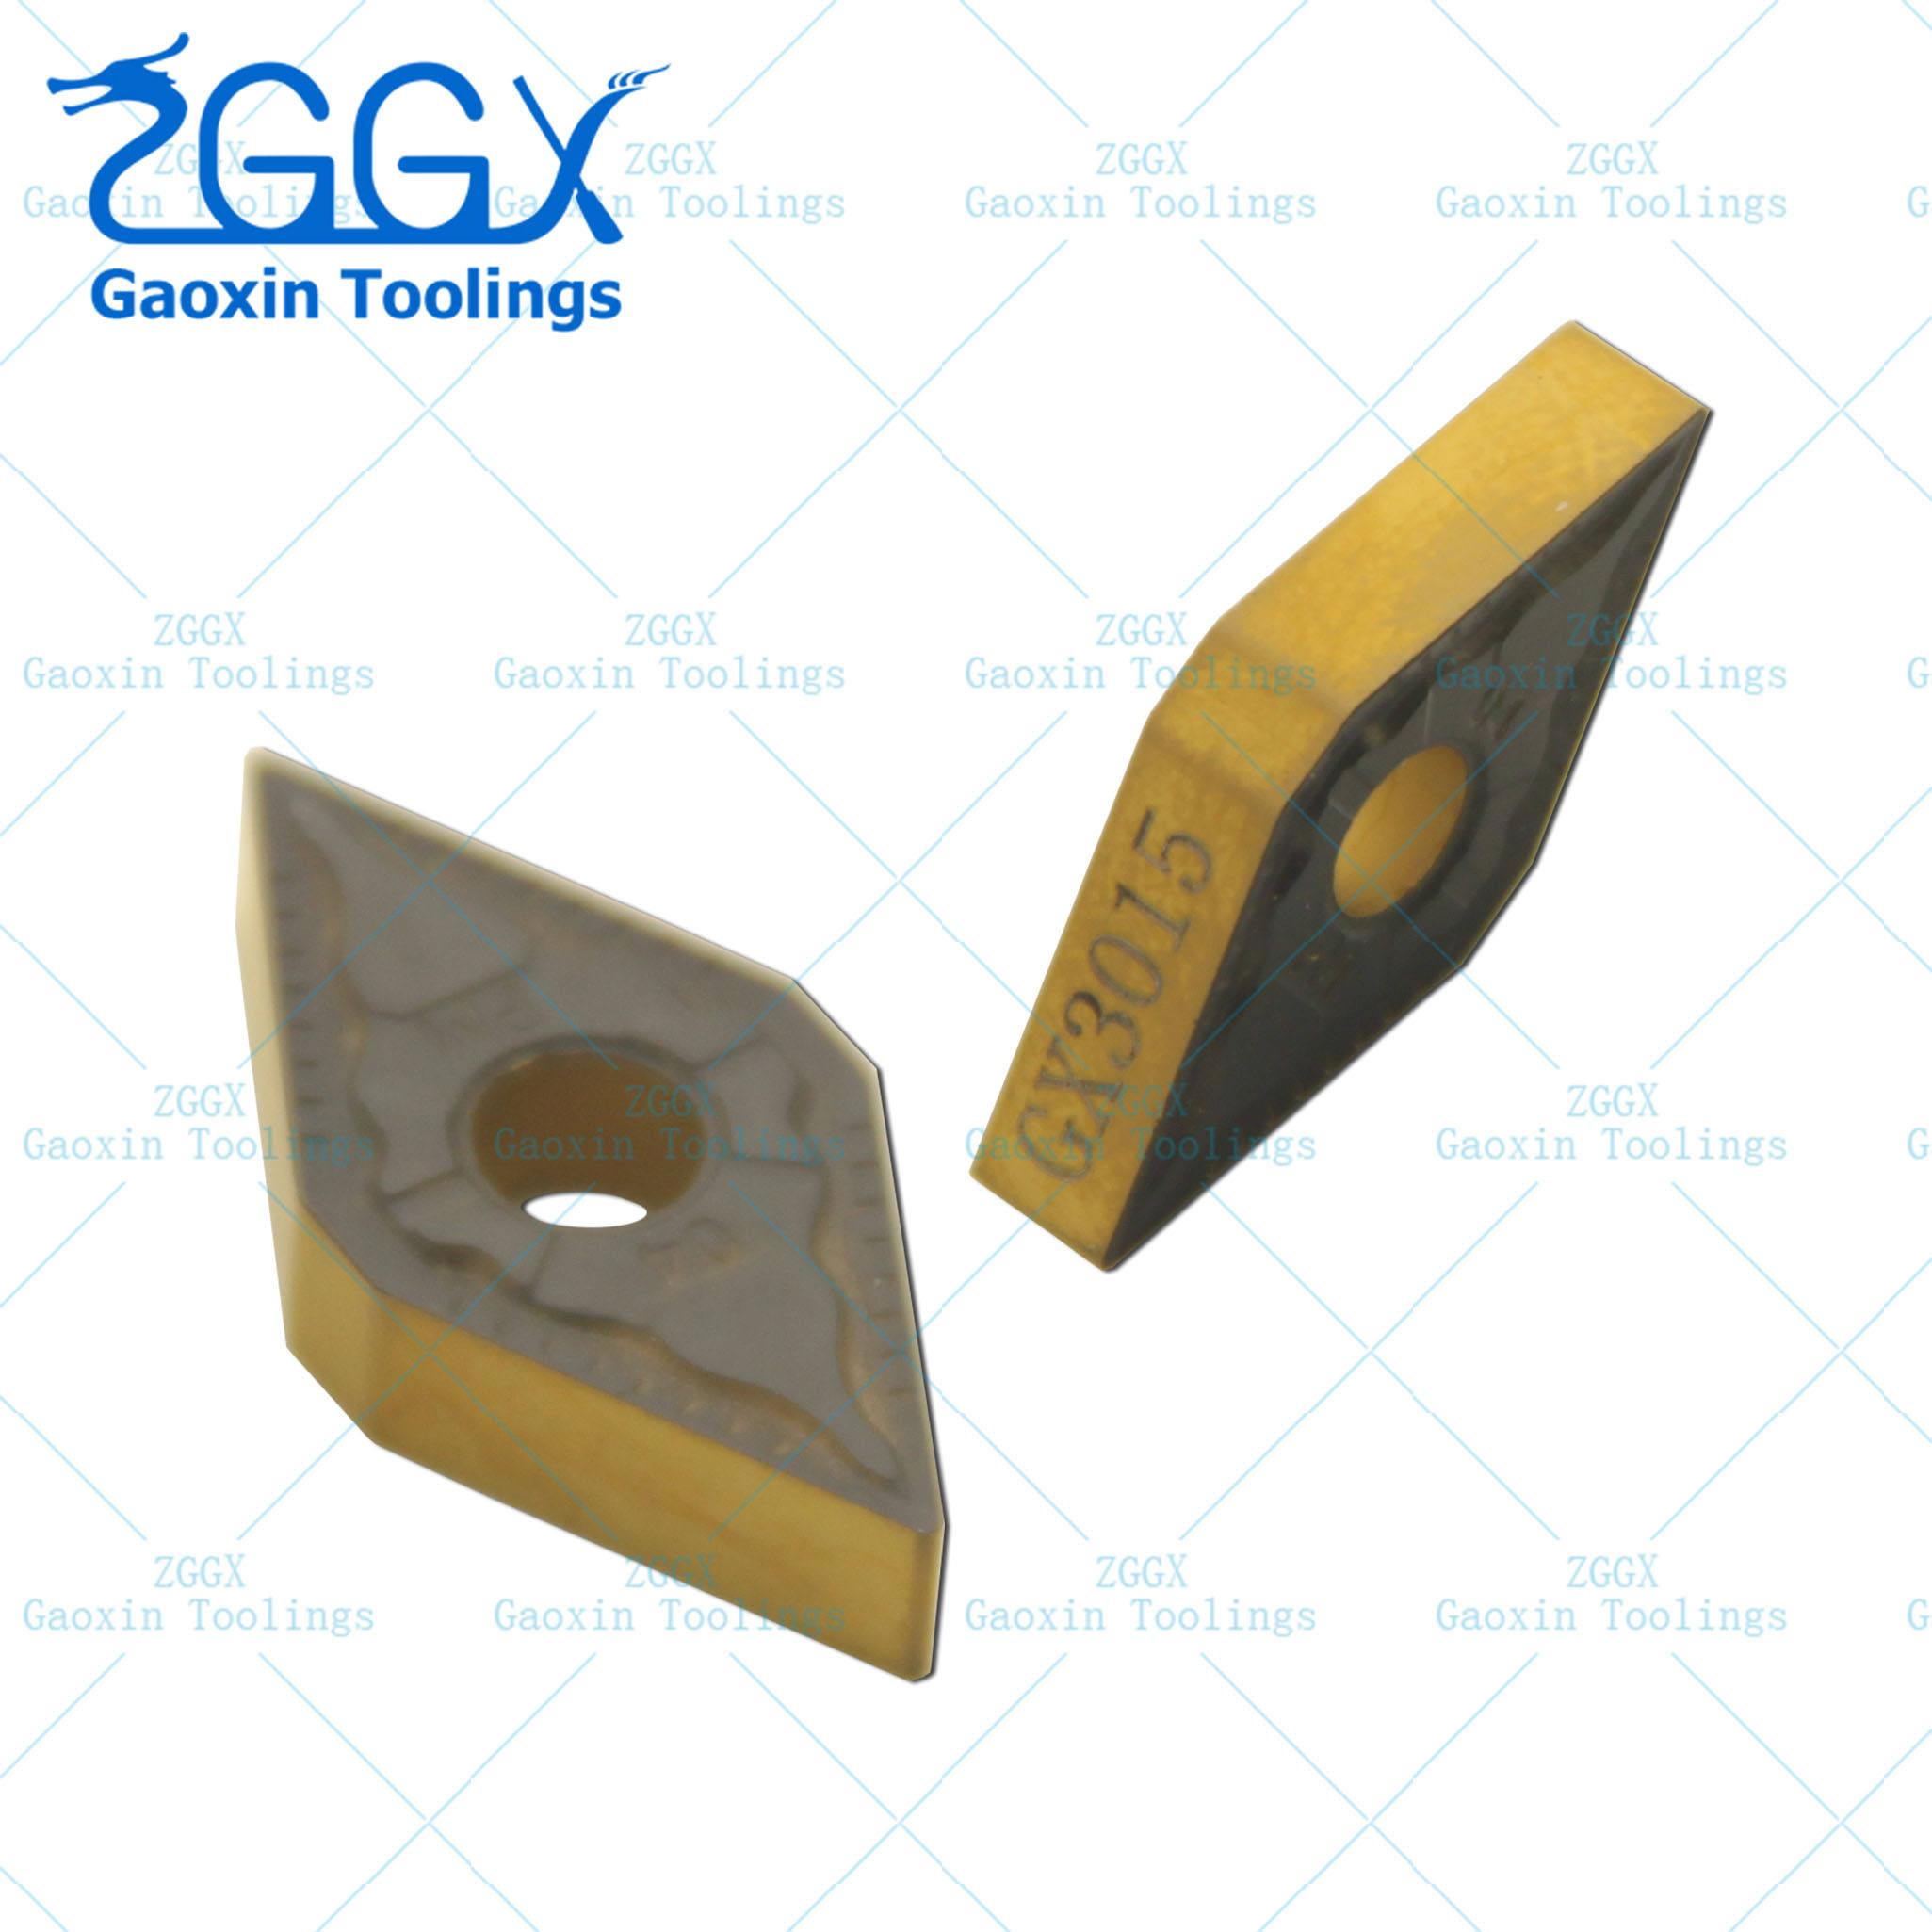 TNMG160404 TM GP5020 Turning tool holder carbide inserts for steel